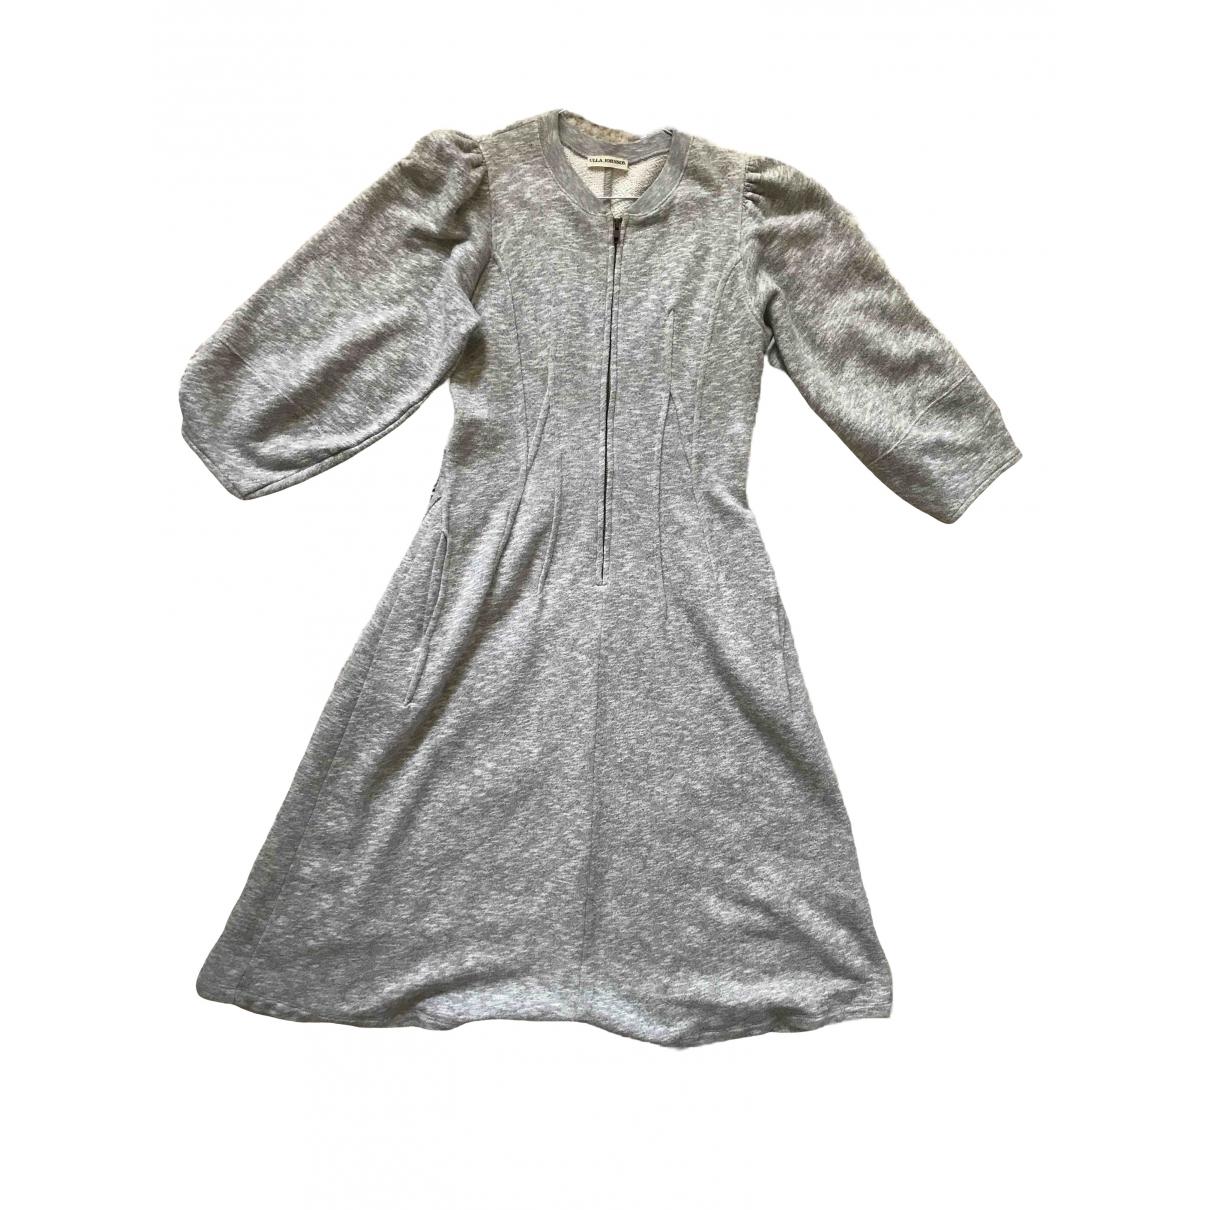 Ulla Johnson \N Grey Cotton dress for Women M International